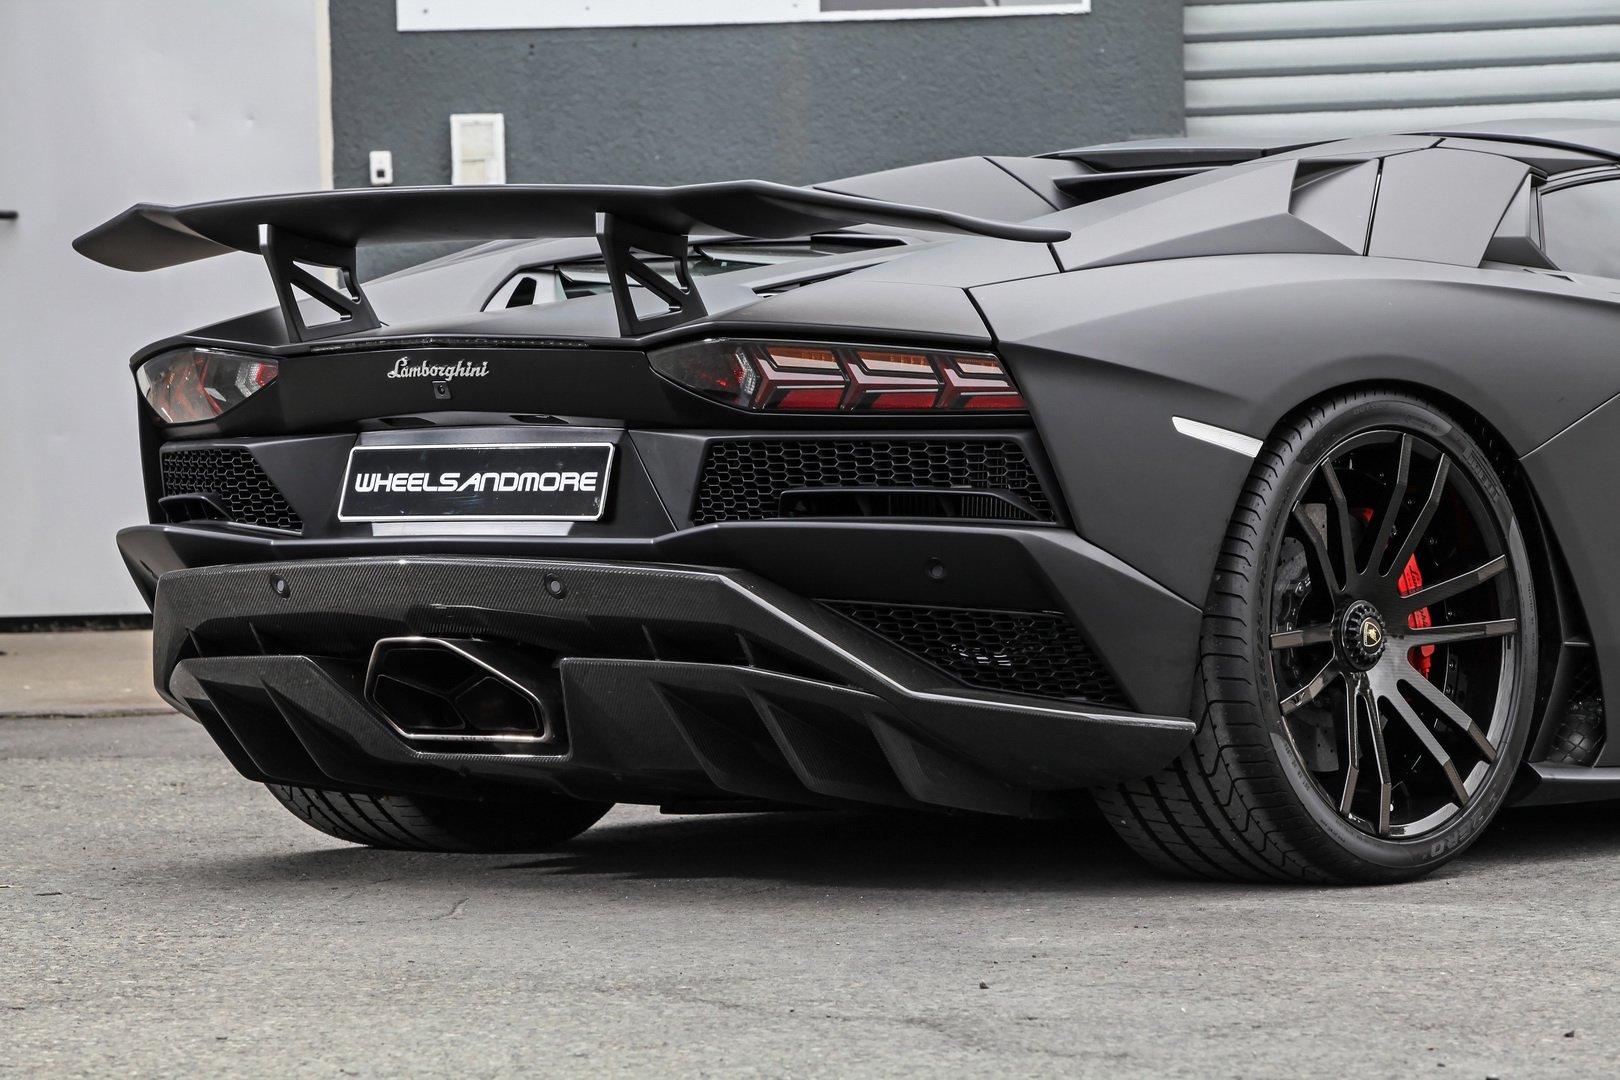 Lamborghini Aventador S Roadster by Wheelsandmore (8)